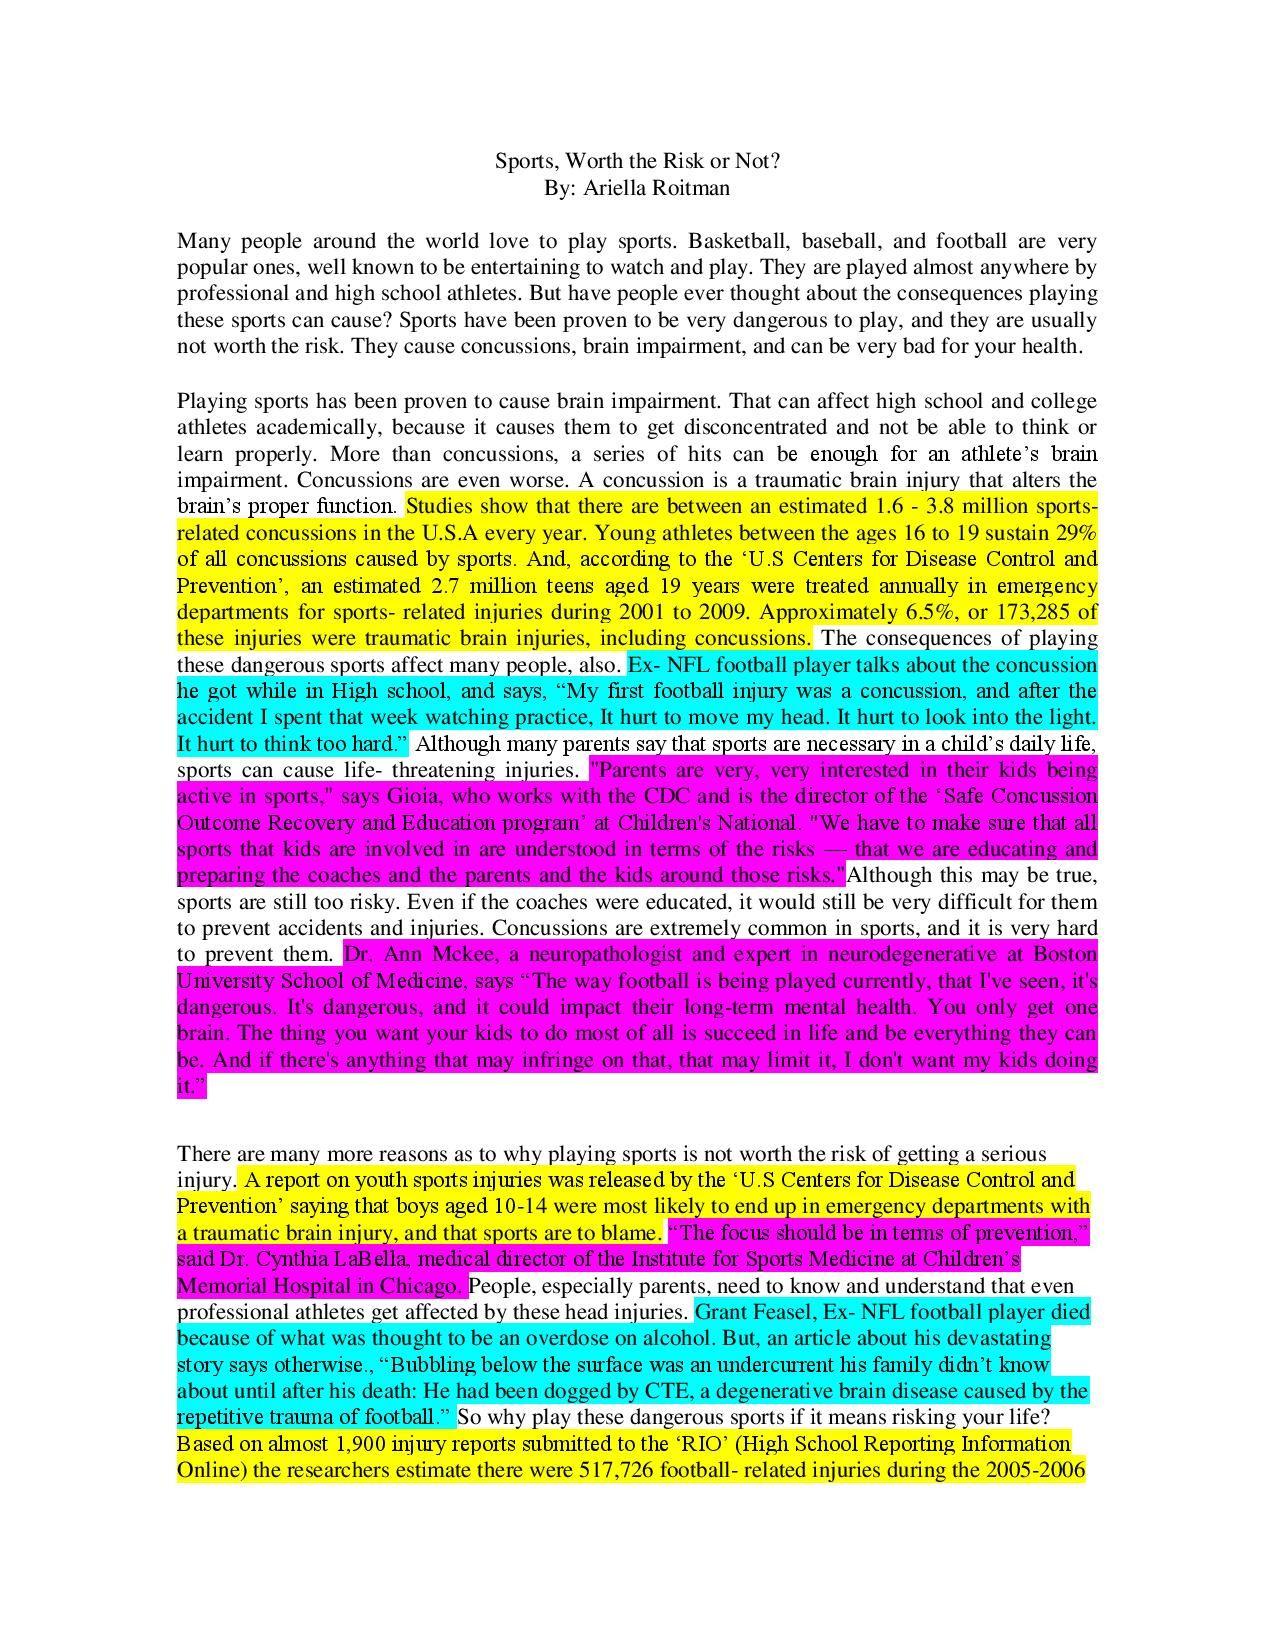 006 Sports Essay Ariella Roitman pg 1 Sports Related